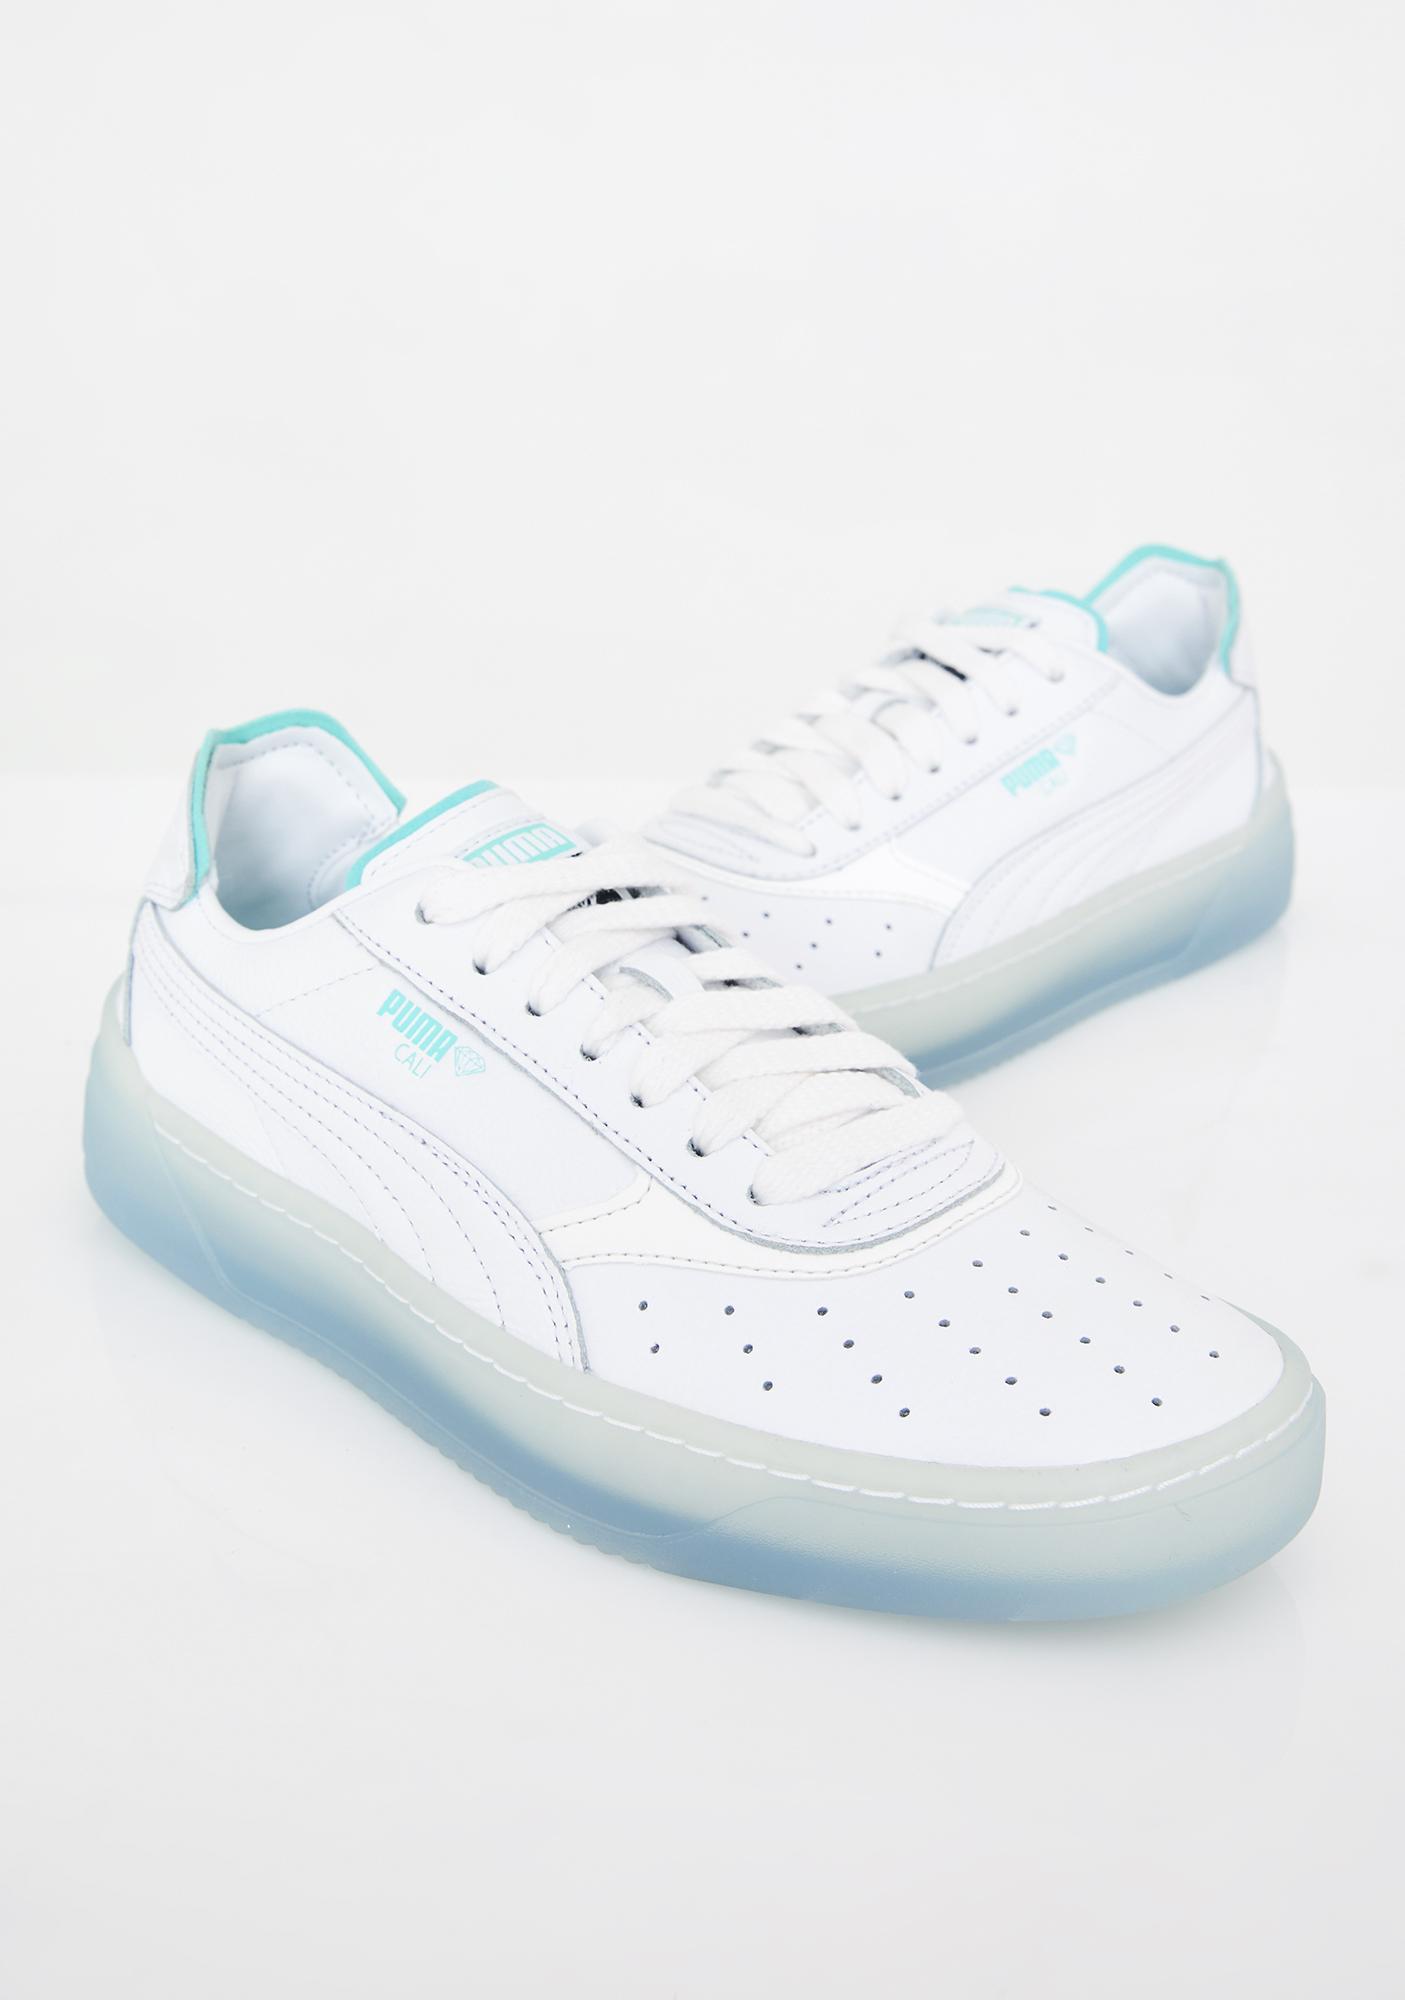 PUMA X Diamond Supply Co. Cali Classic Sneakers